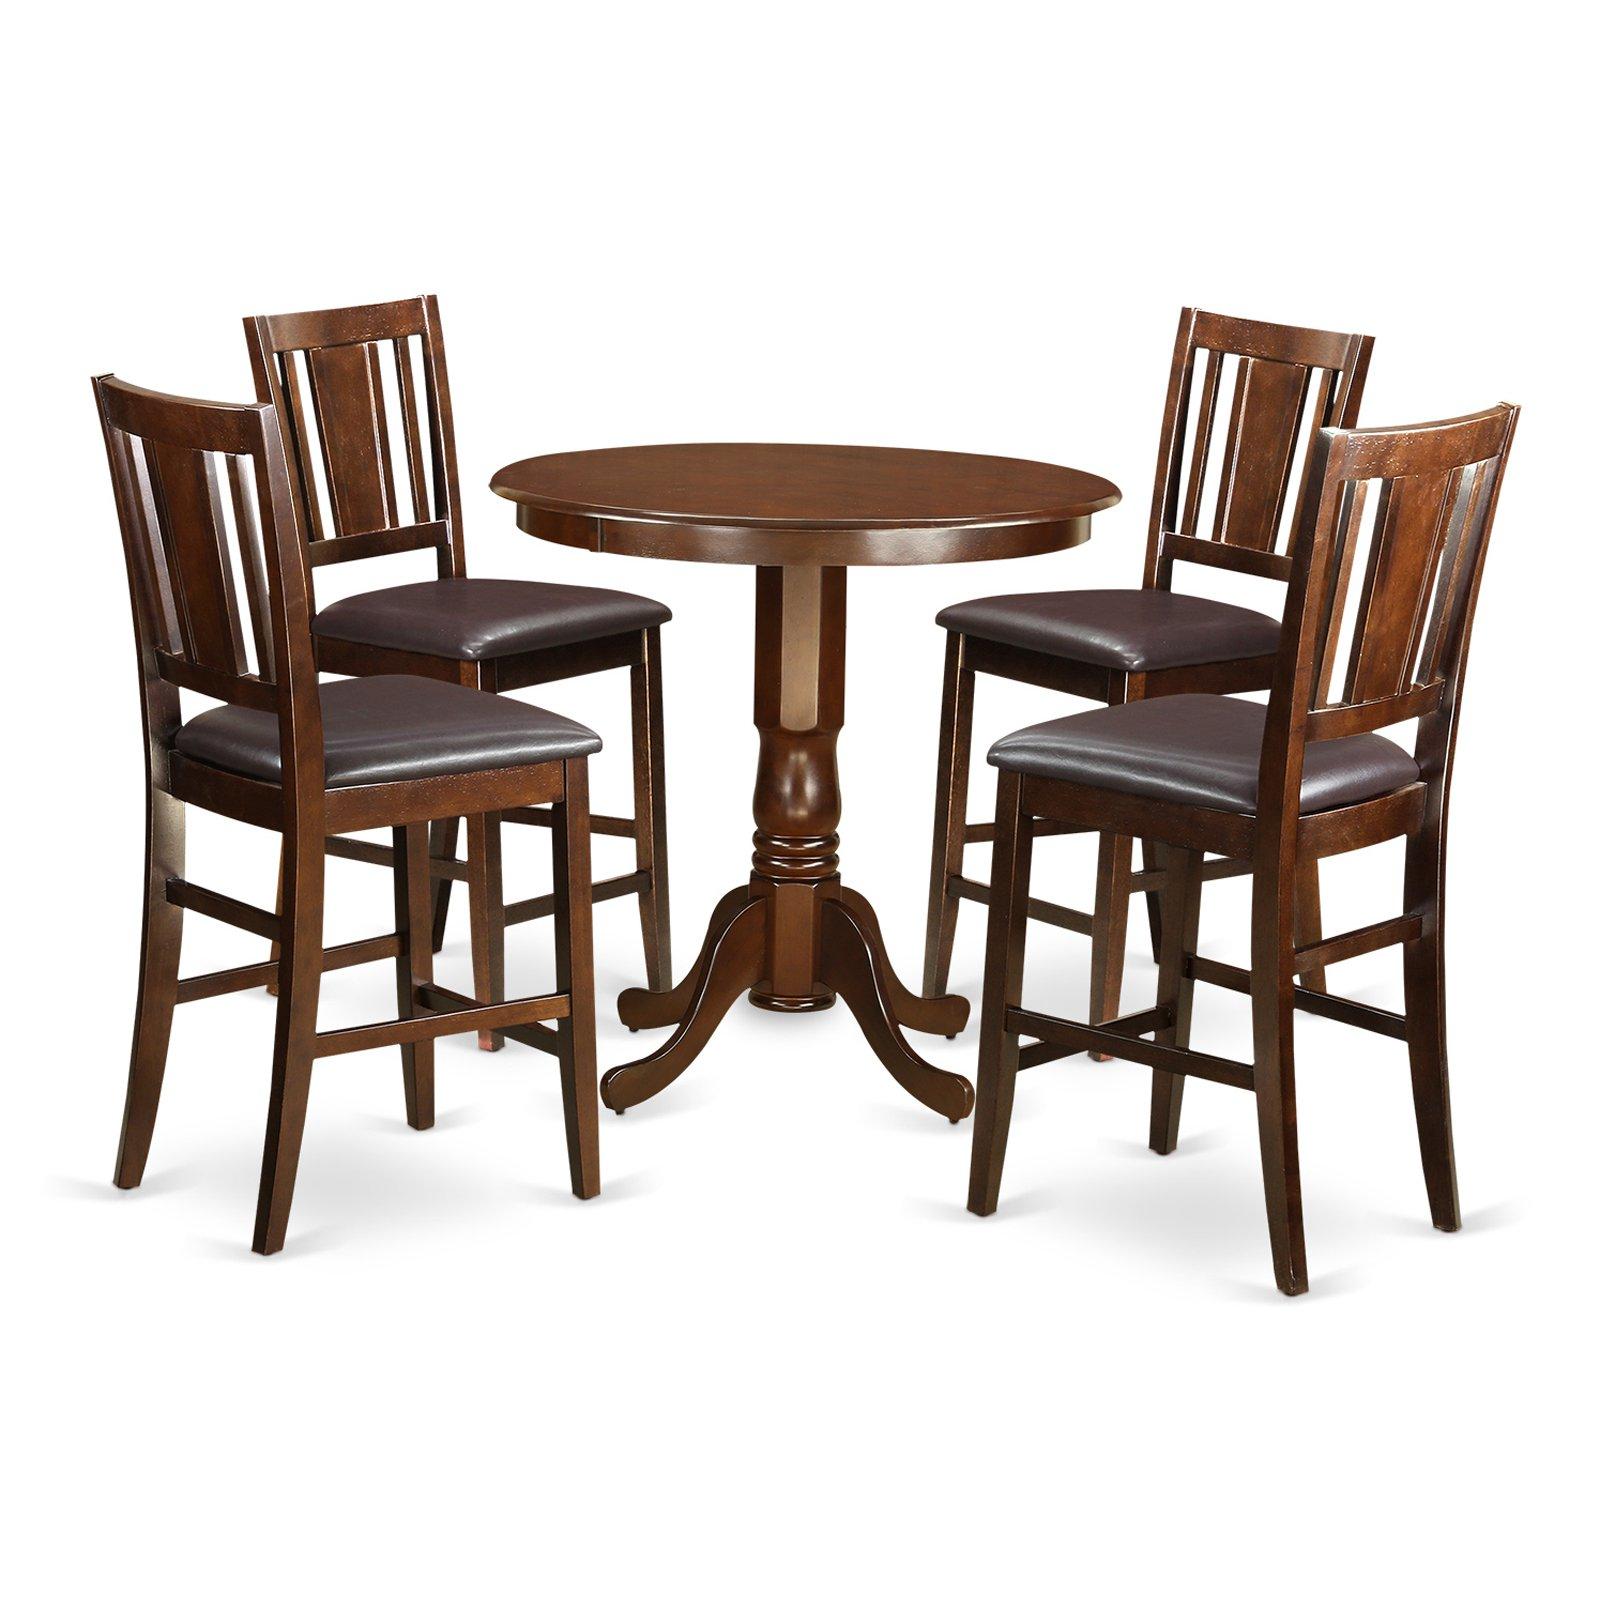 East West Furniture Jackson 5 Piece Scotch Art Dining Table Set